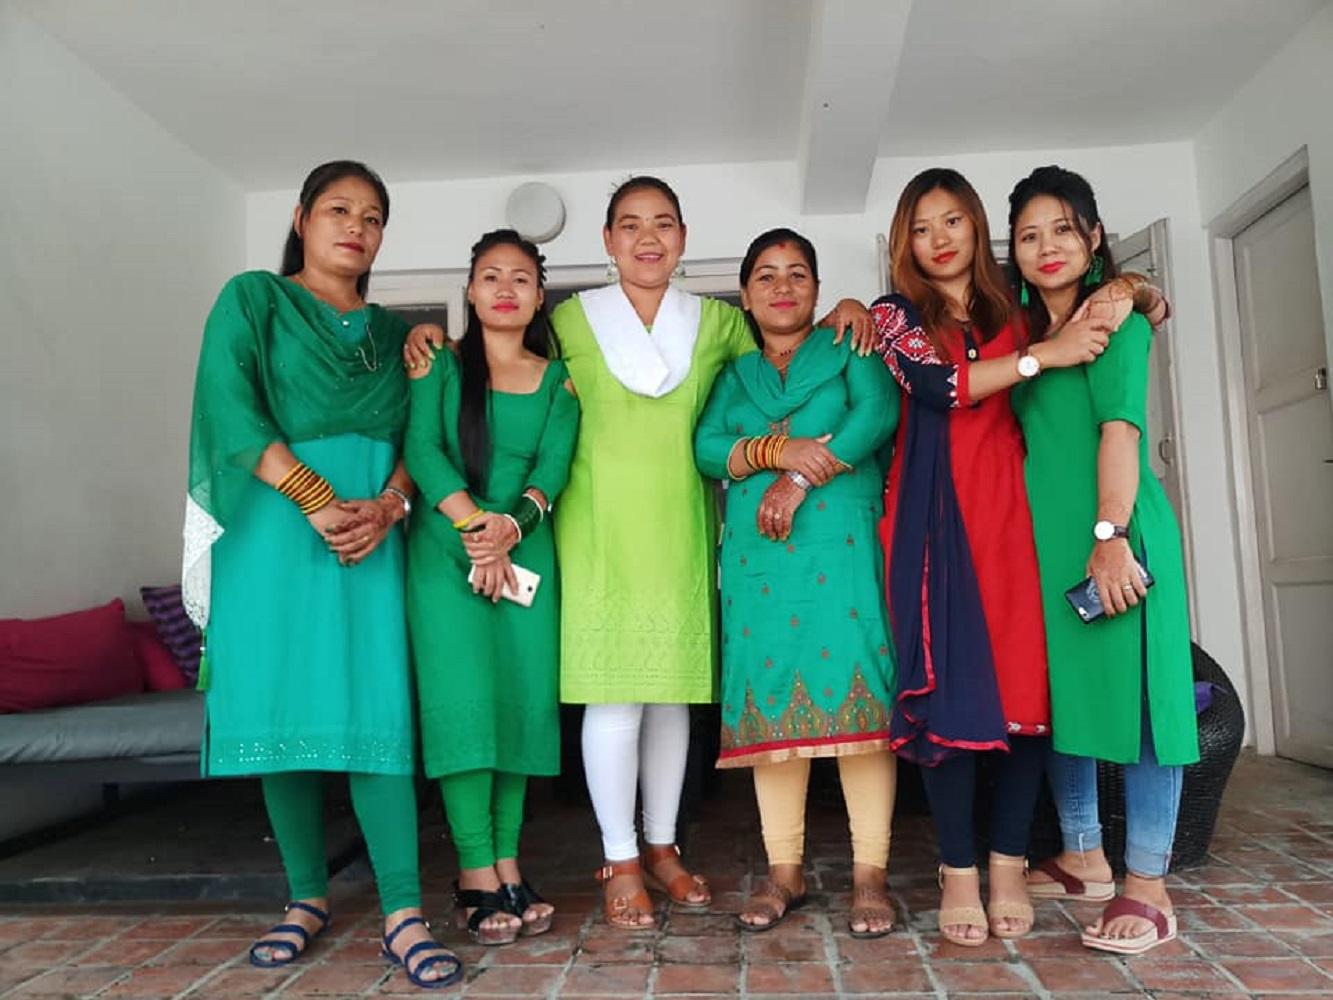 Dorje an her team at Tings Kathmandu